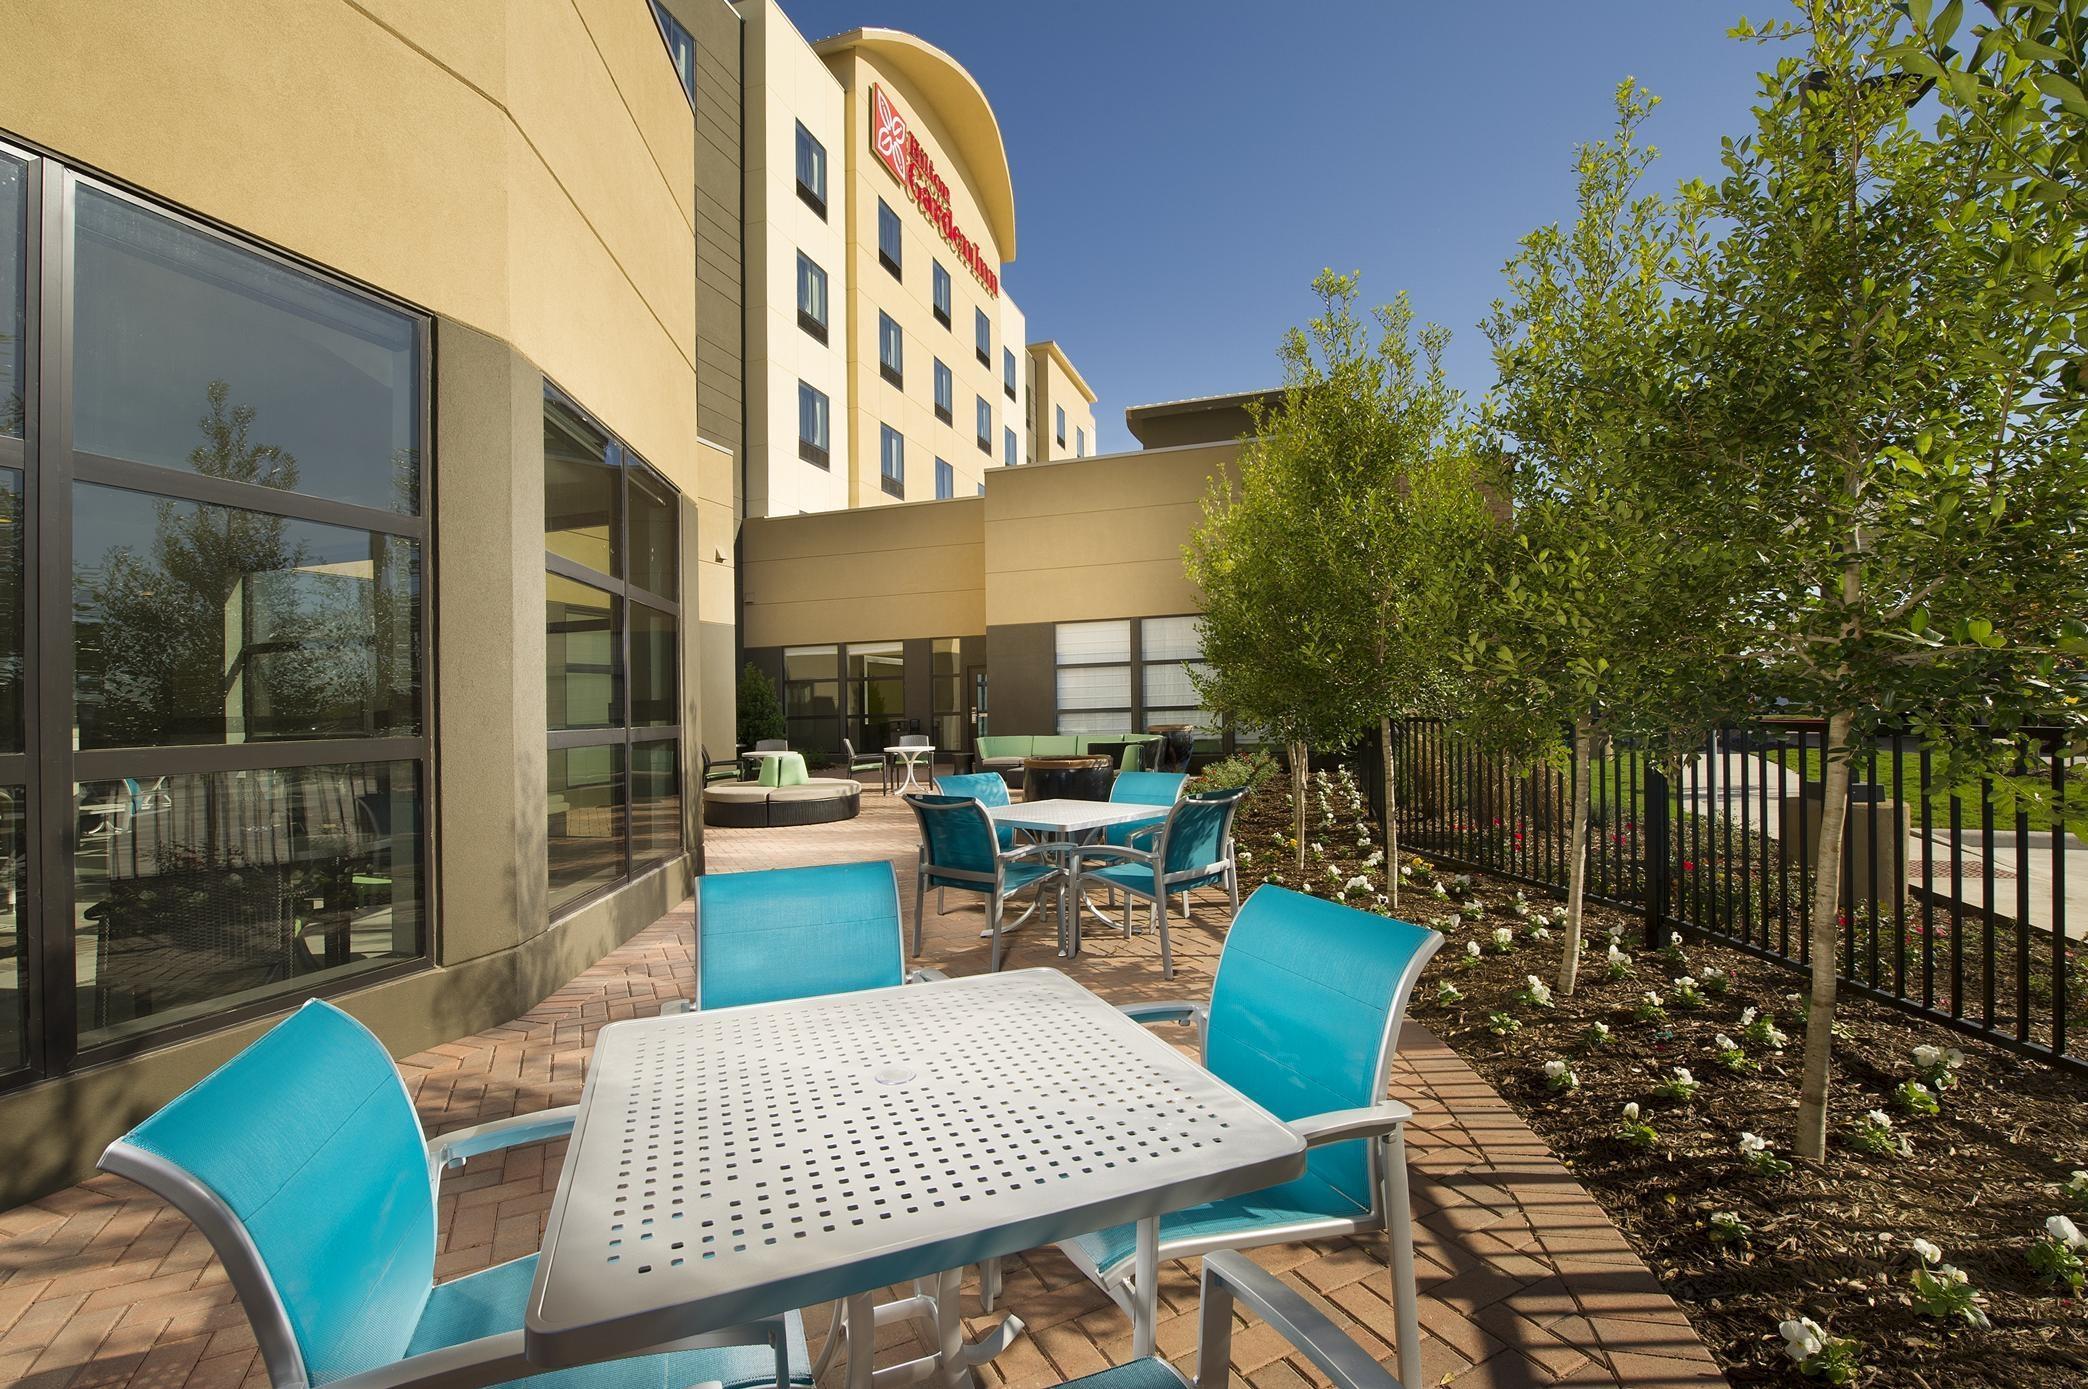 Hilton Garden Inn College Station image 23